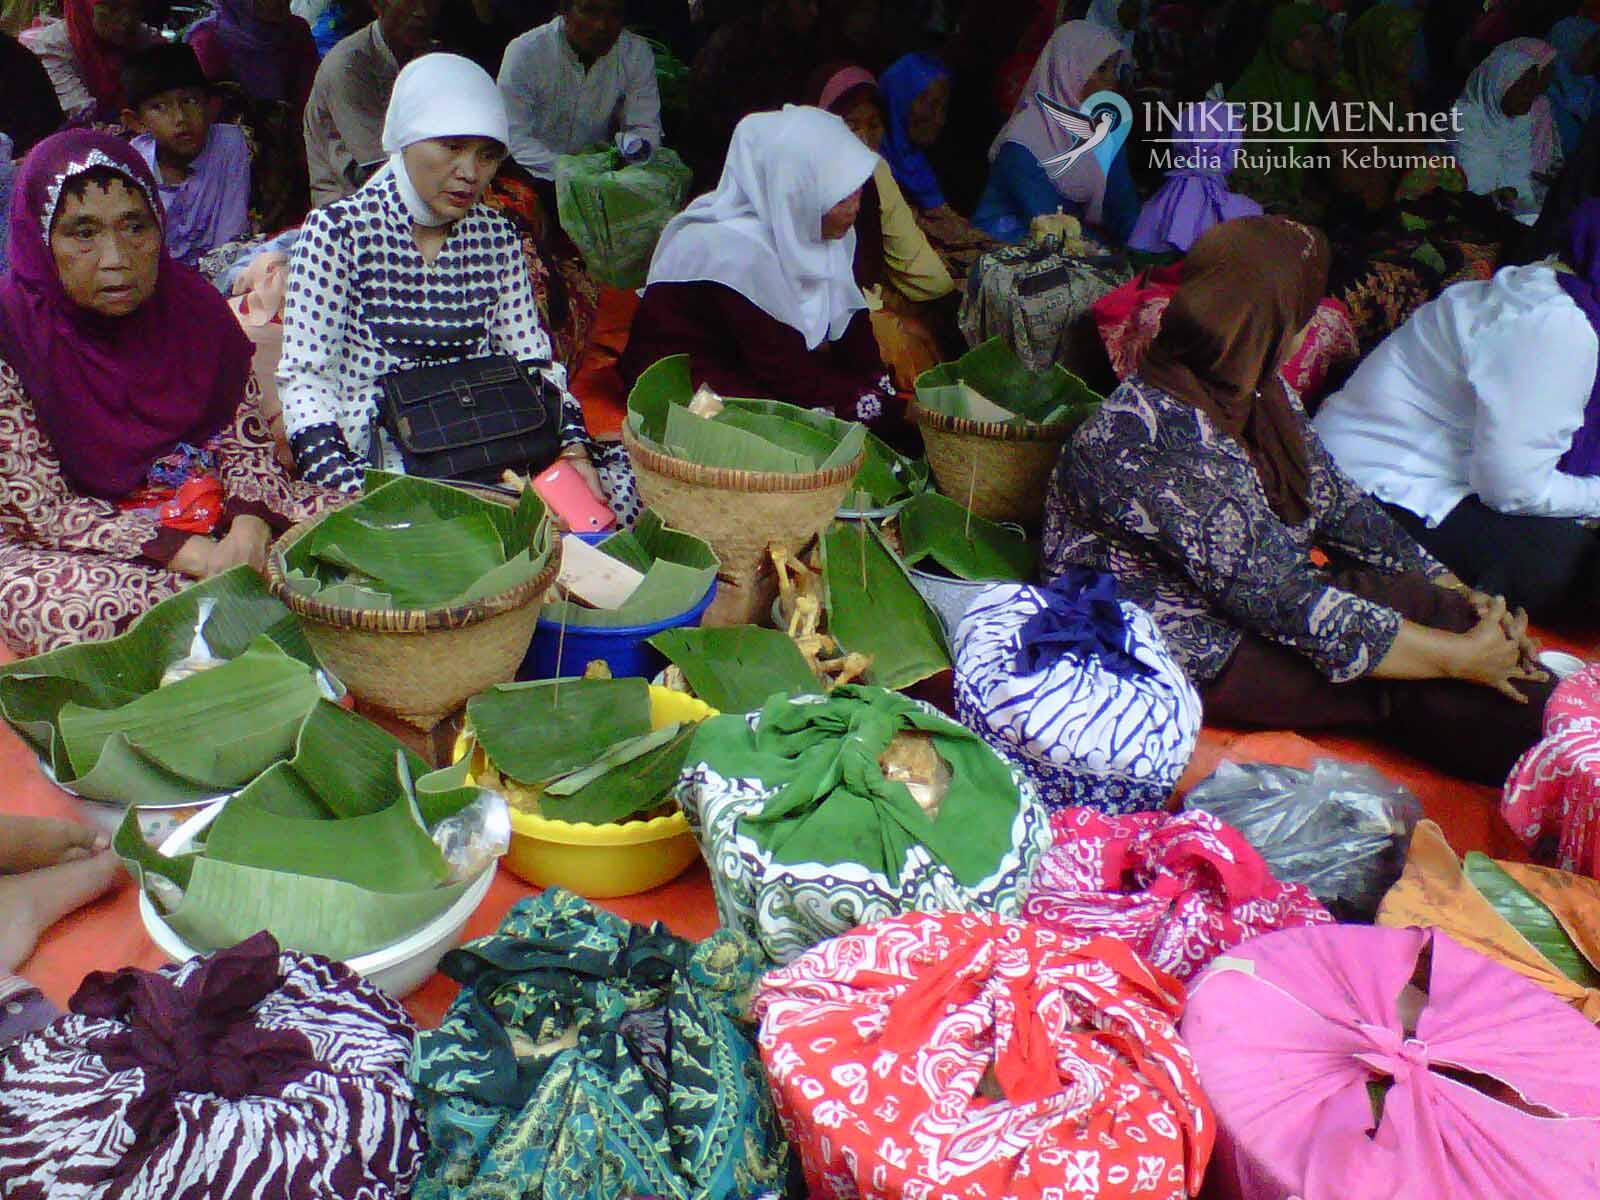 Ribuan Ingkung Bakal Meriahkan Haul Syekh Ibrahim Asmorokondi